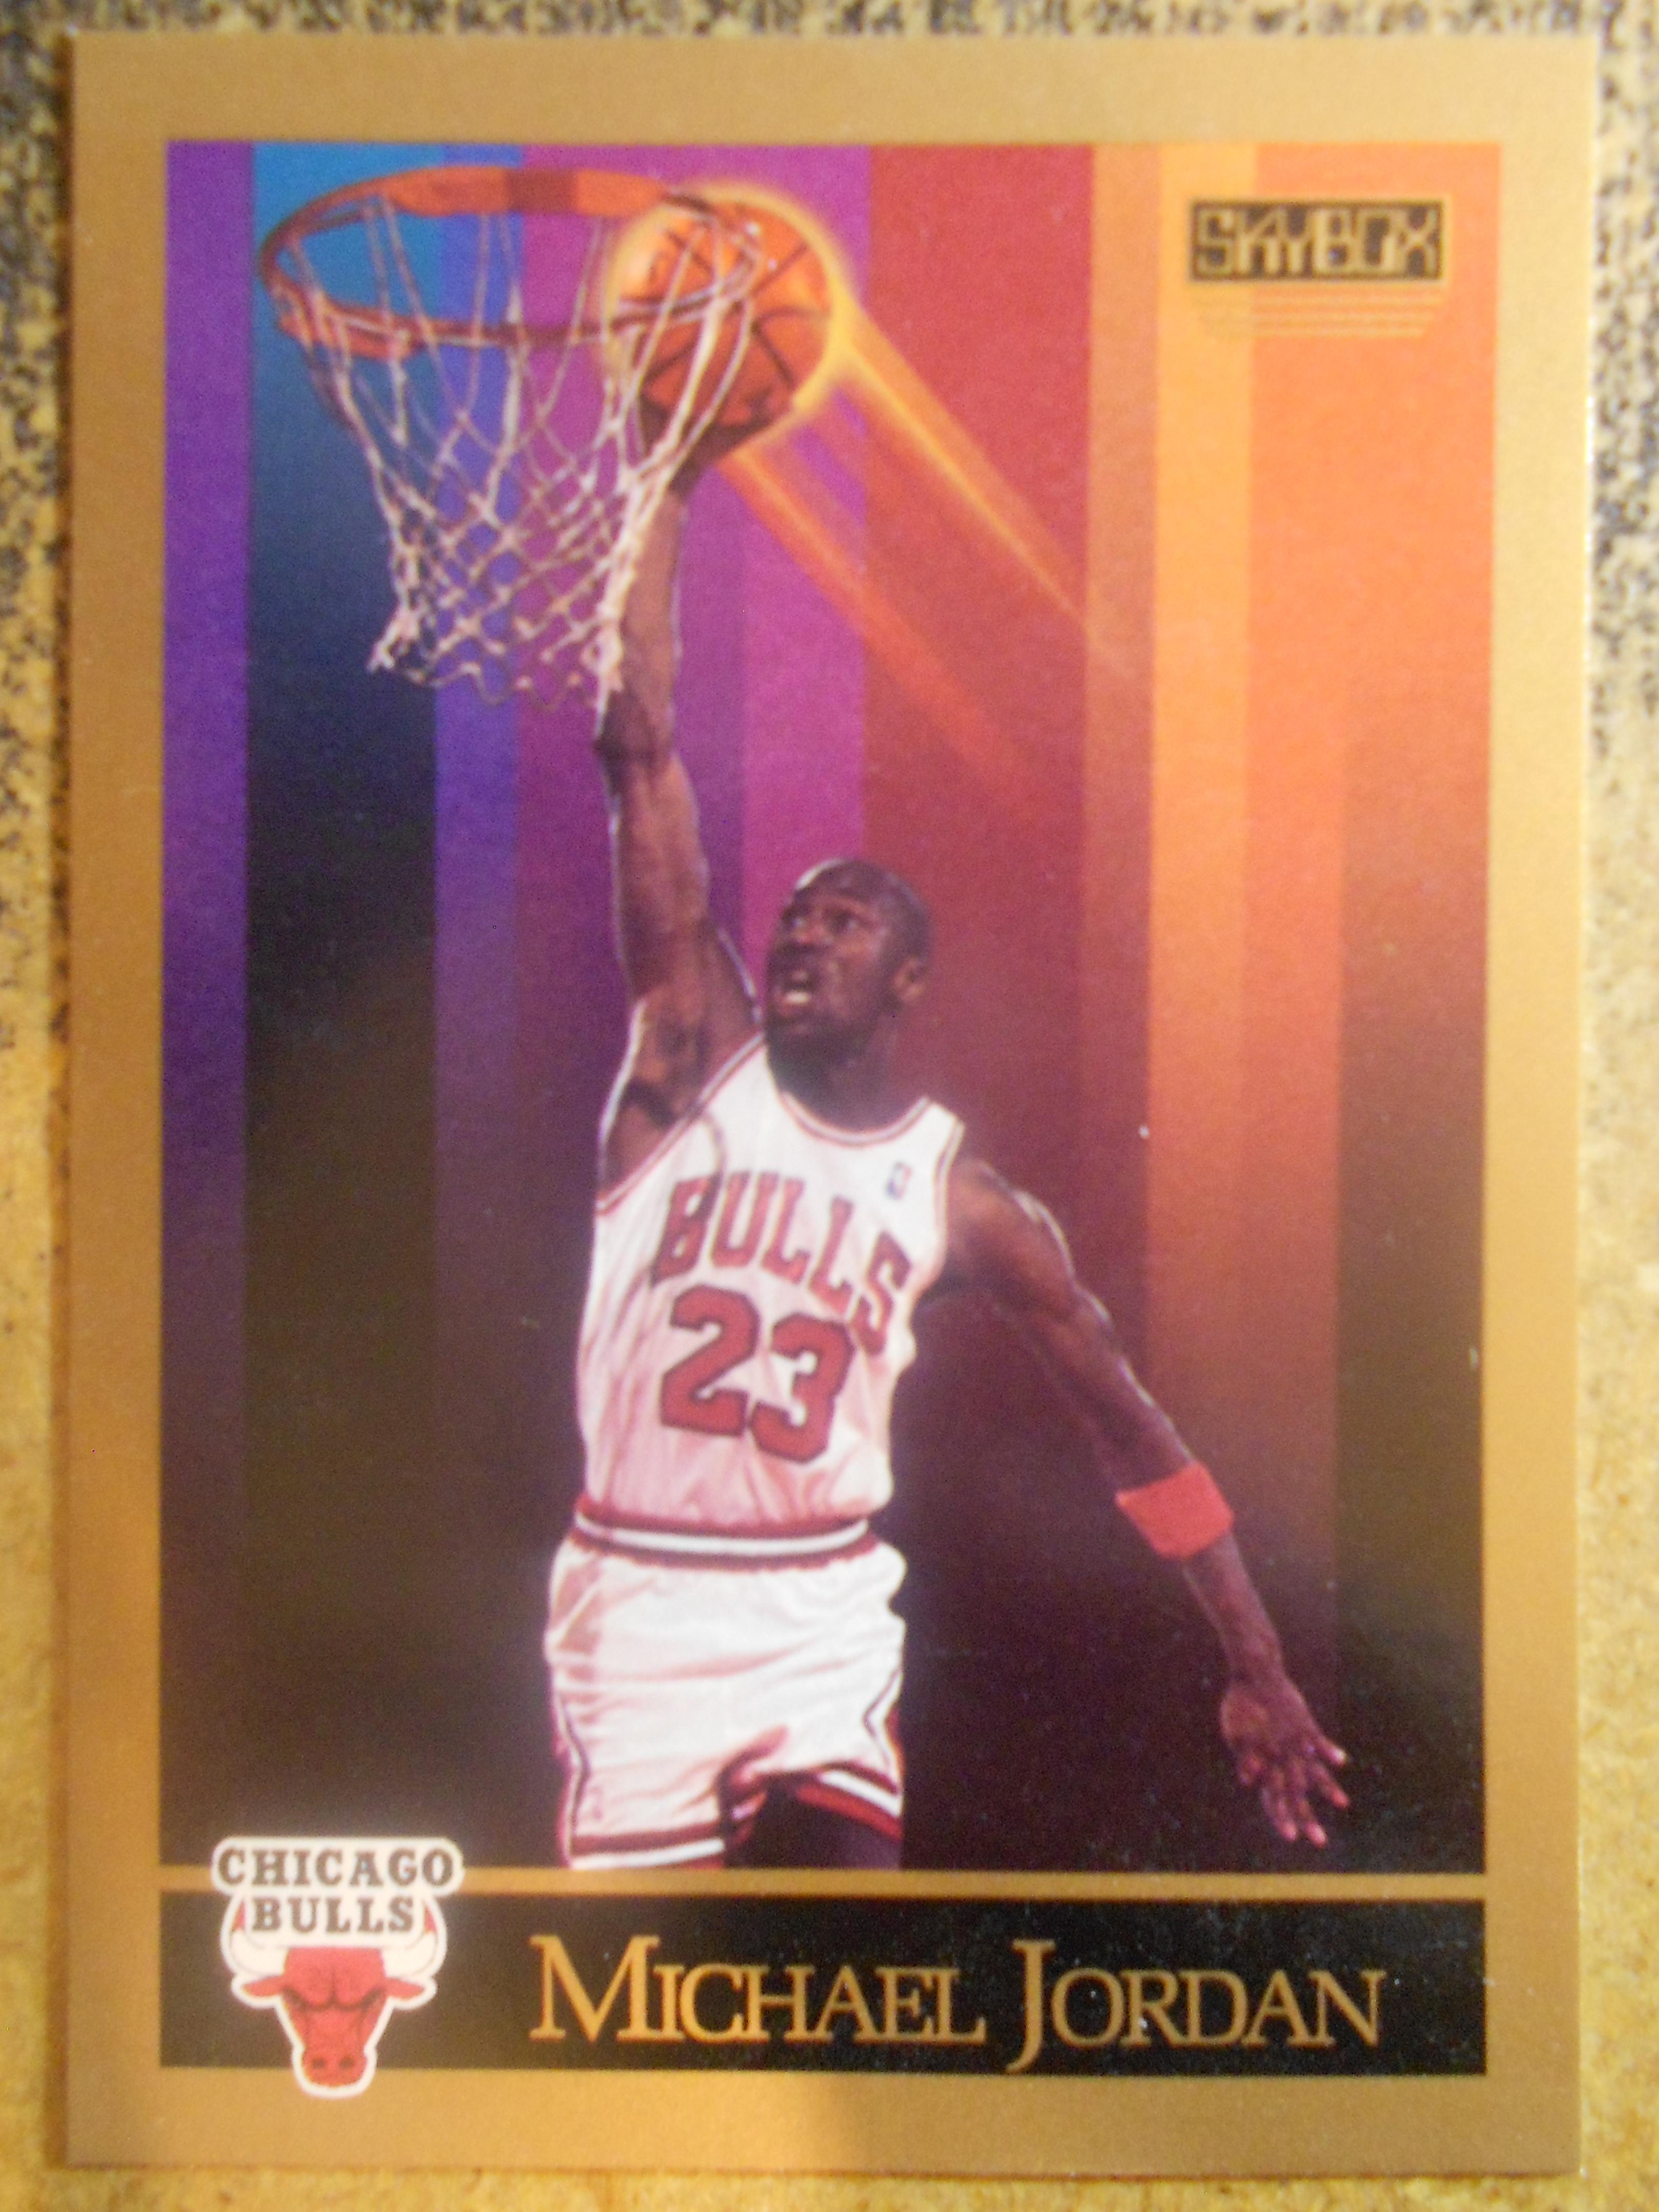 Air Jordan 1990-91 Cartes De Basket-ball Skybox réduction 2015 iZhzAxXg5